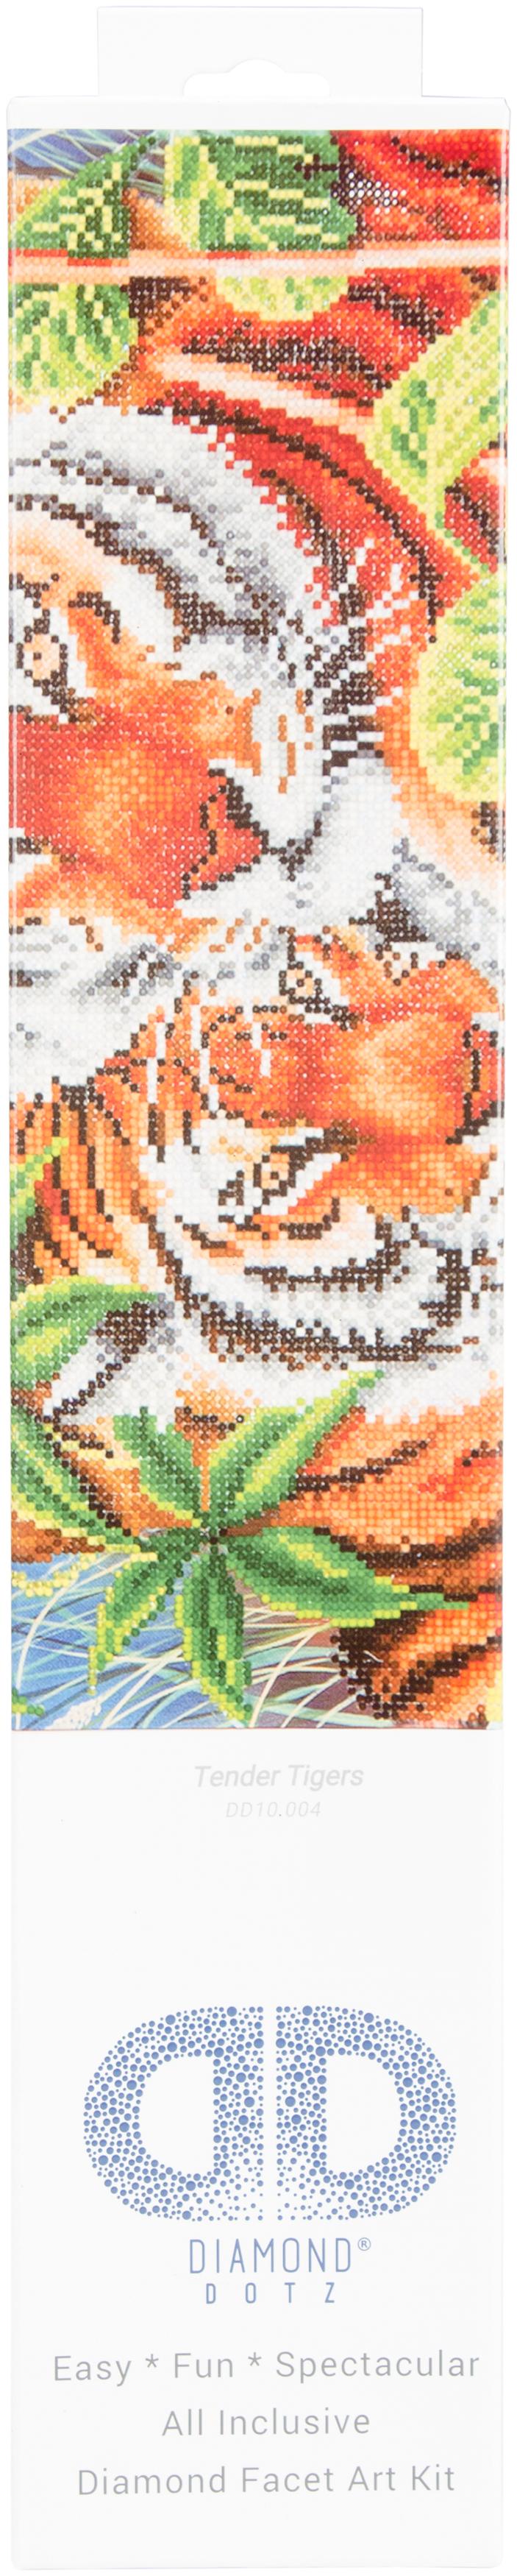 Diamond Dotz Diamond Embroidery Facet Art Kit 23.5X17-Tender Tiger